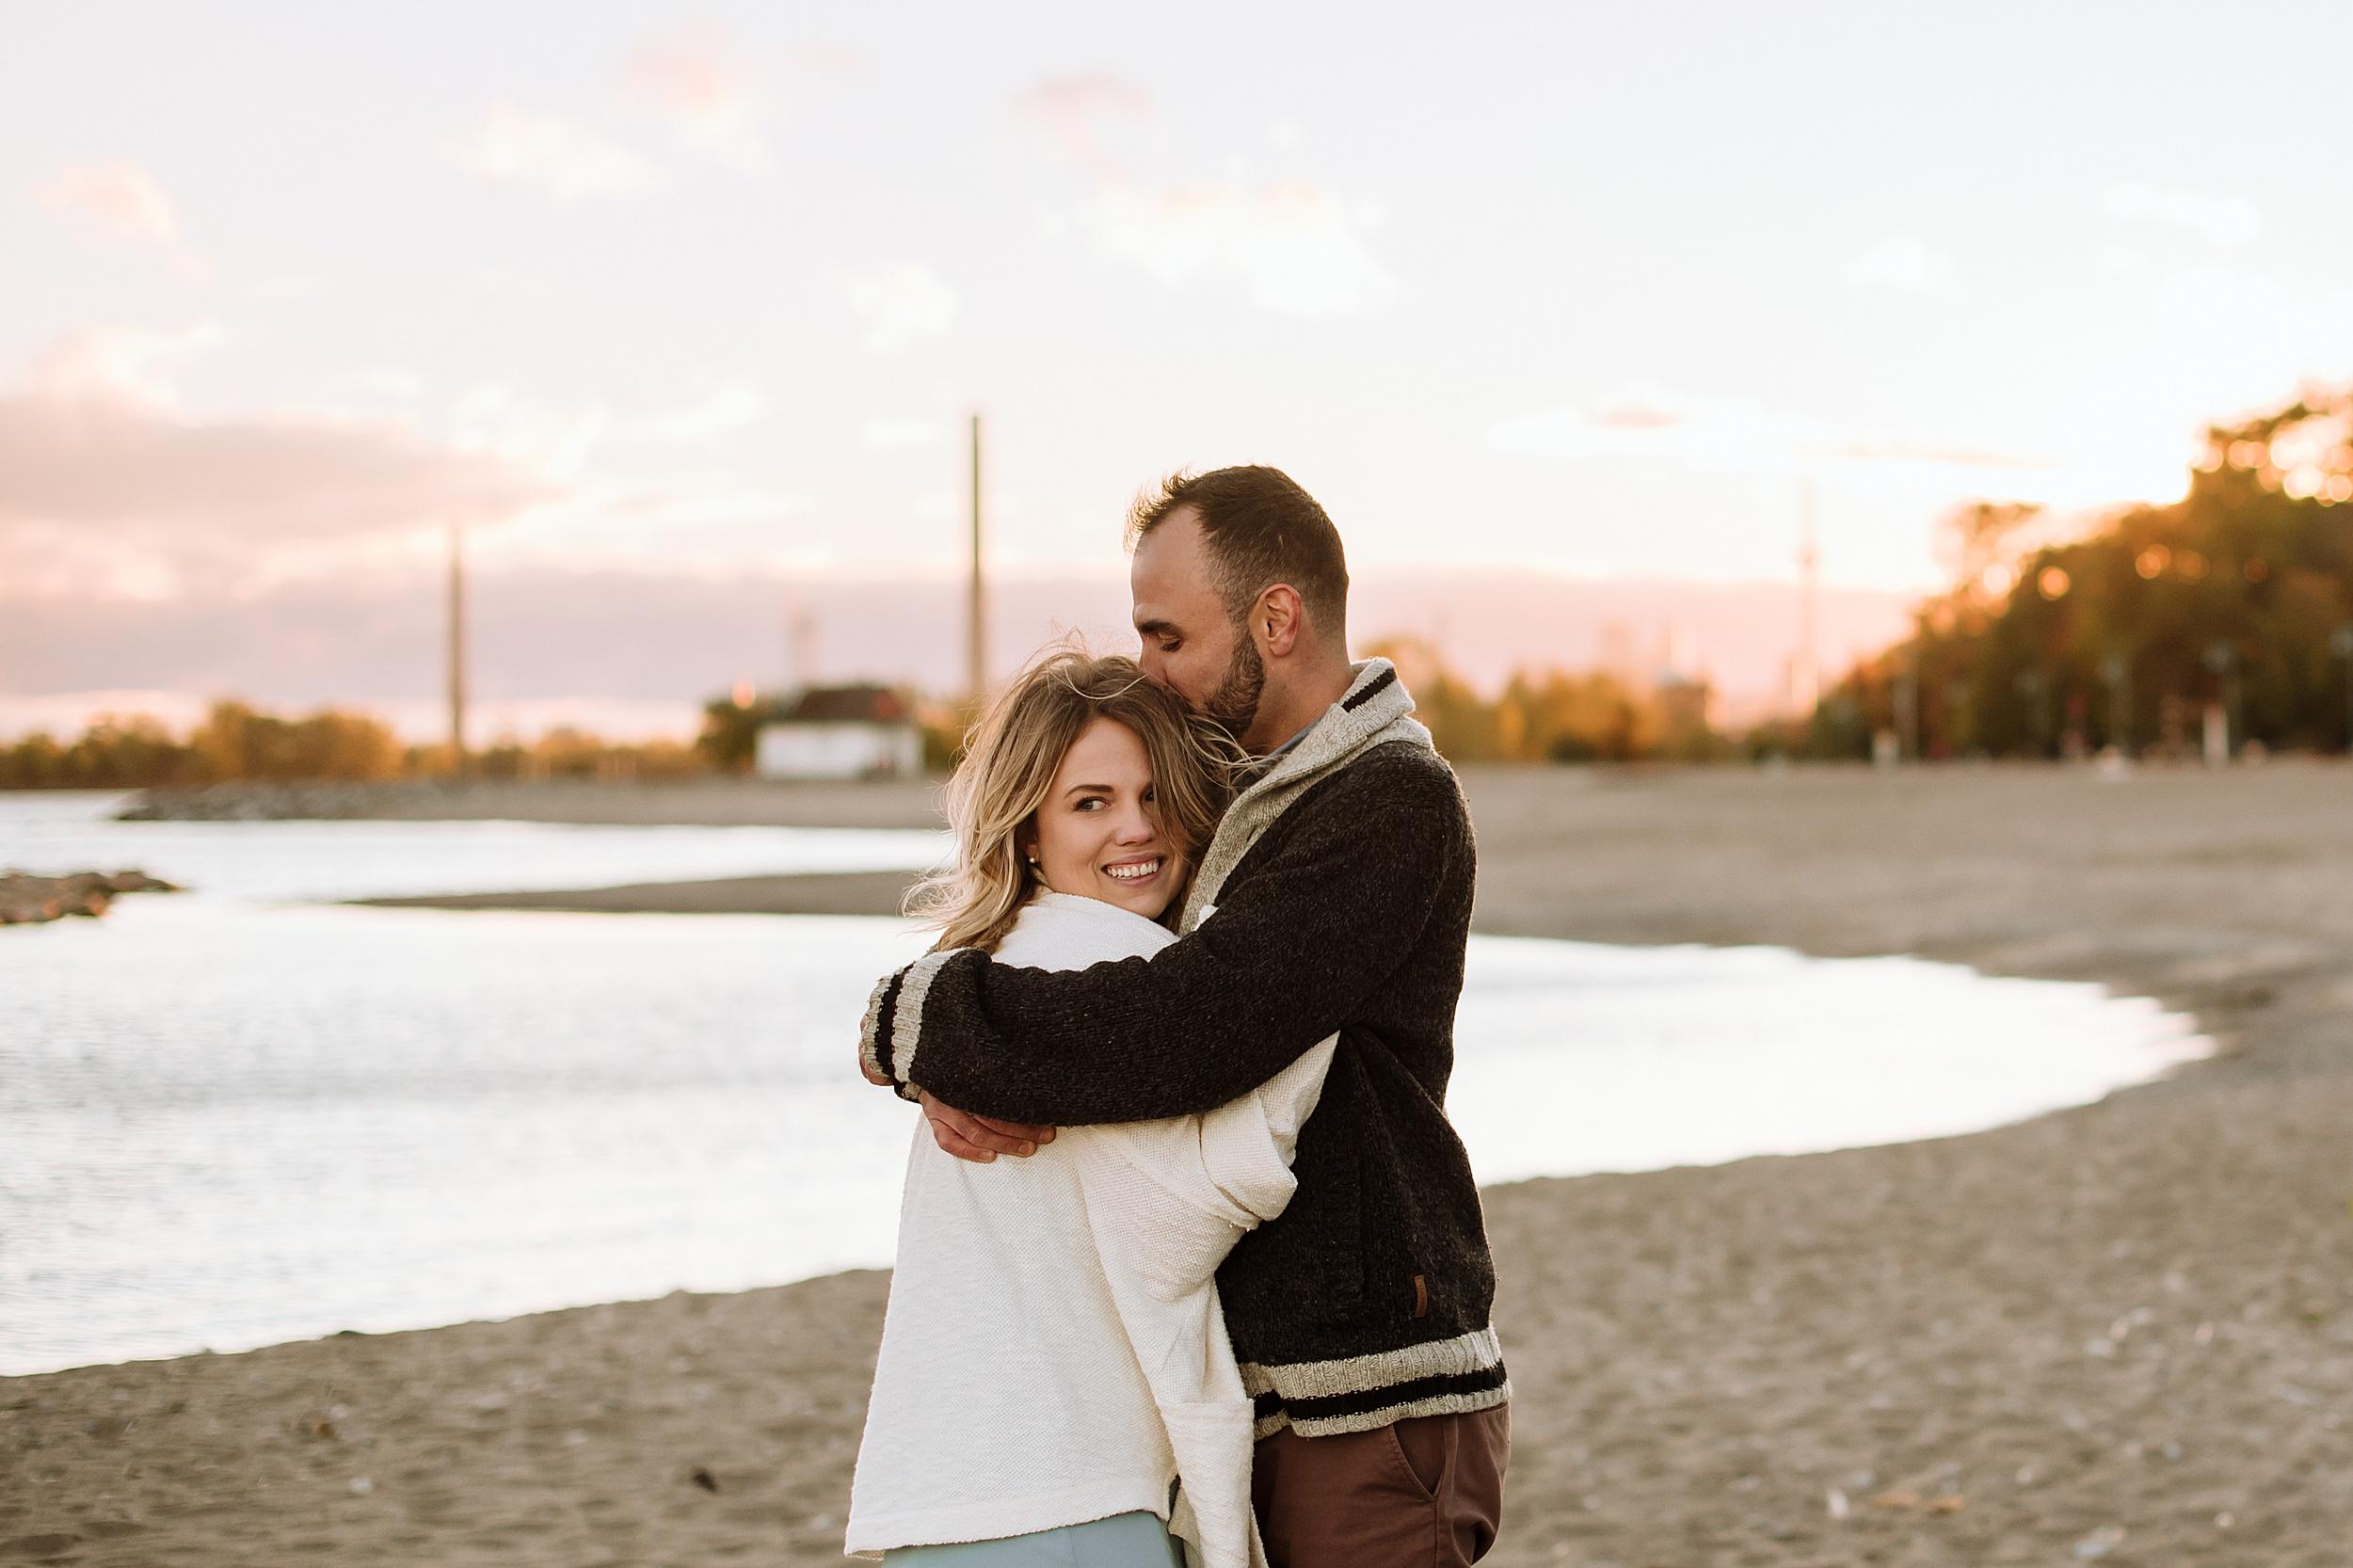 Toronto_Wedding_Photographers_Engagement_Shoot_The_Beaches_014.jpg